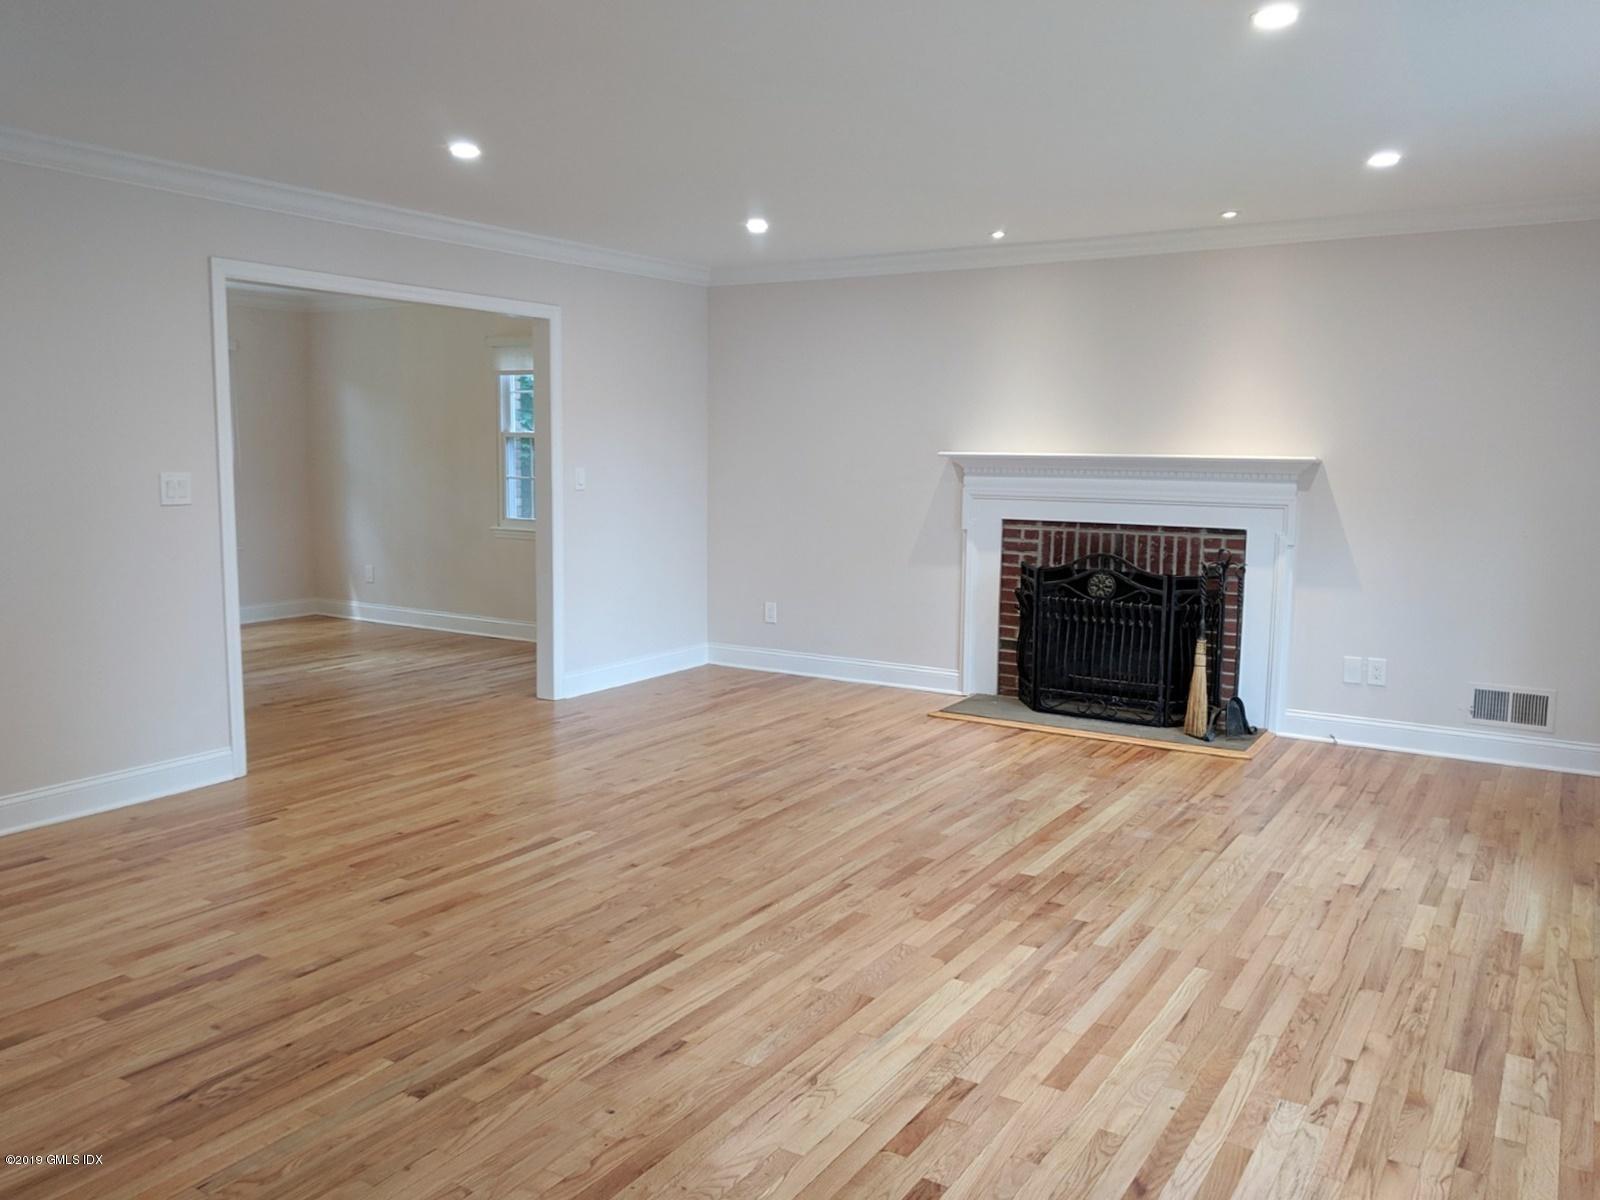 96 Valley Road,Cos Cob,Connecticut 06807,3 Bedrooms Bedrooms,1 BathroomBathrooms,See remarks,Valley,108041